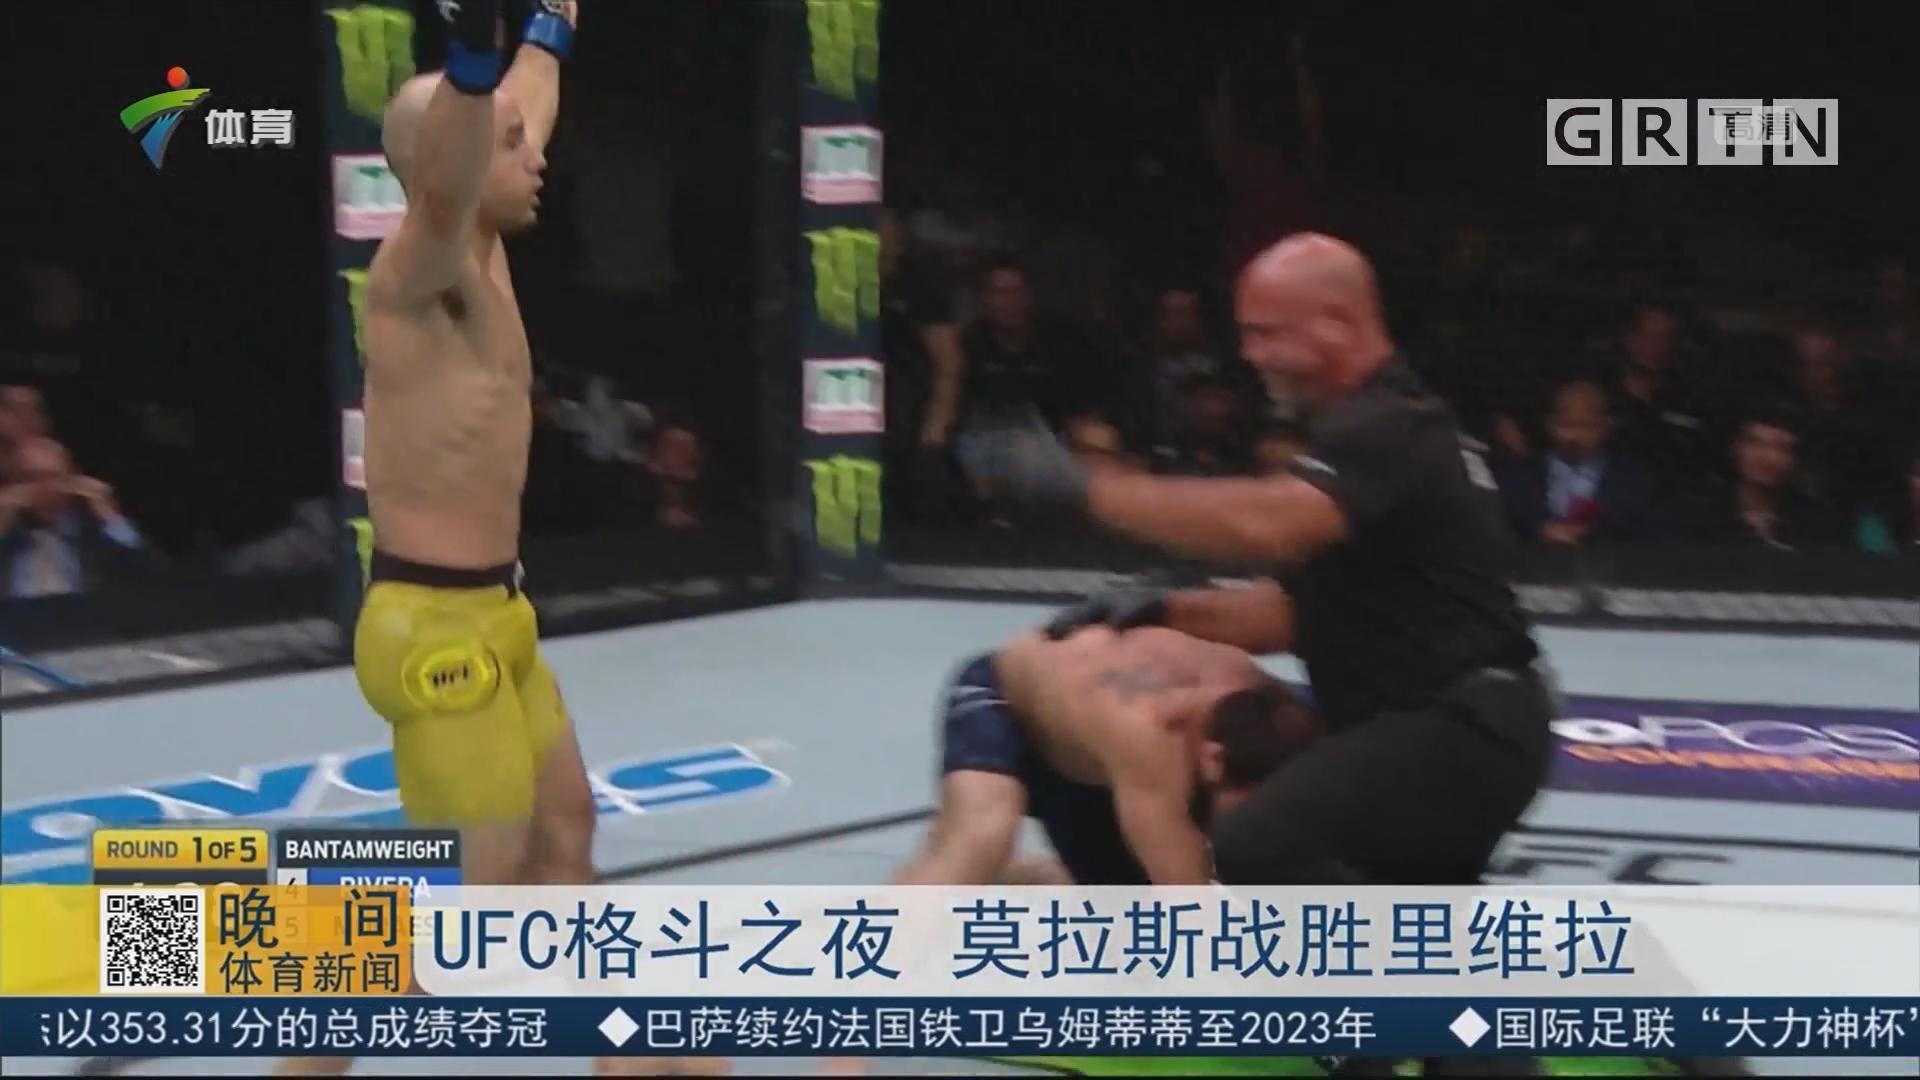 UFC格斗之夜 莫拉斯战胜里维拉